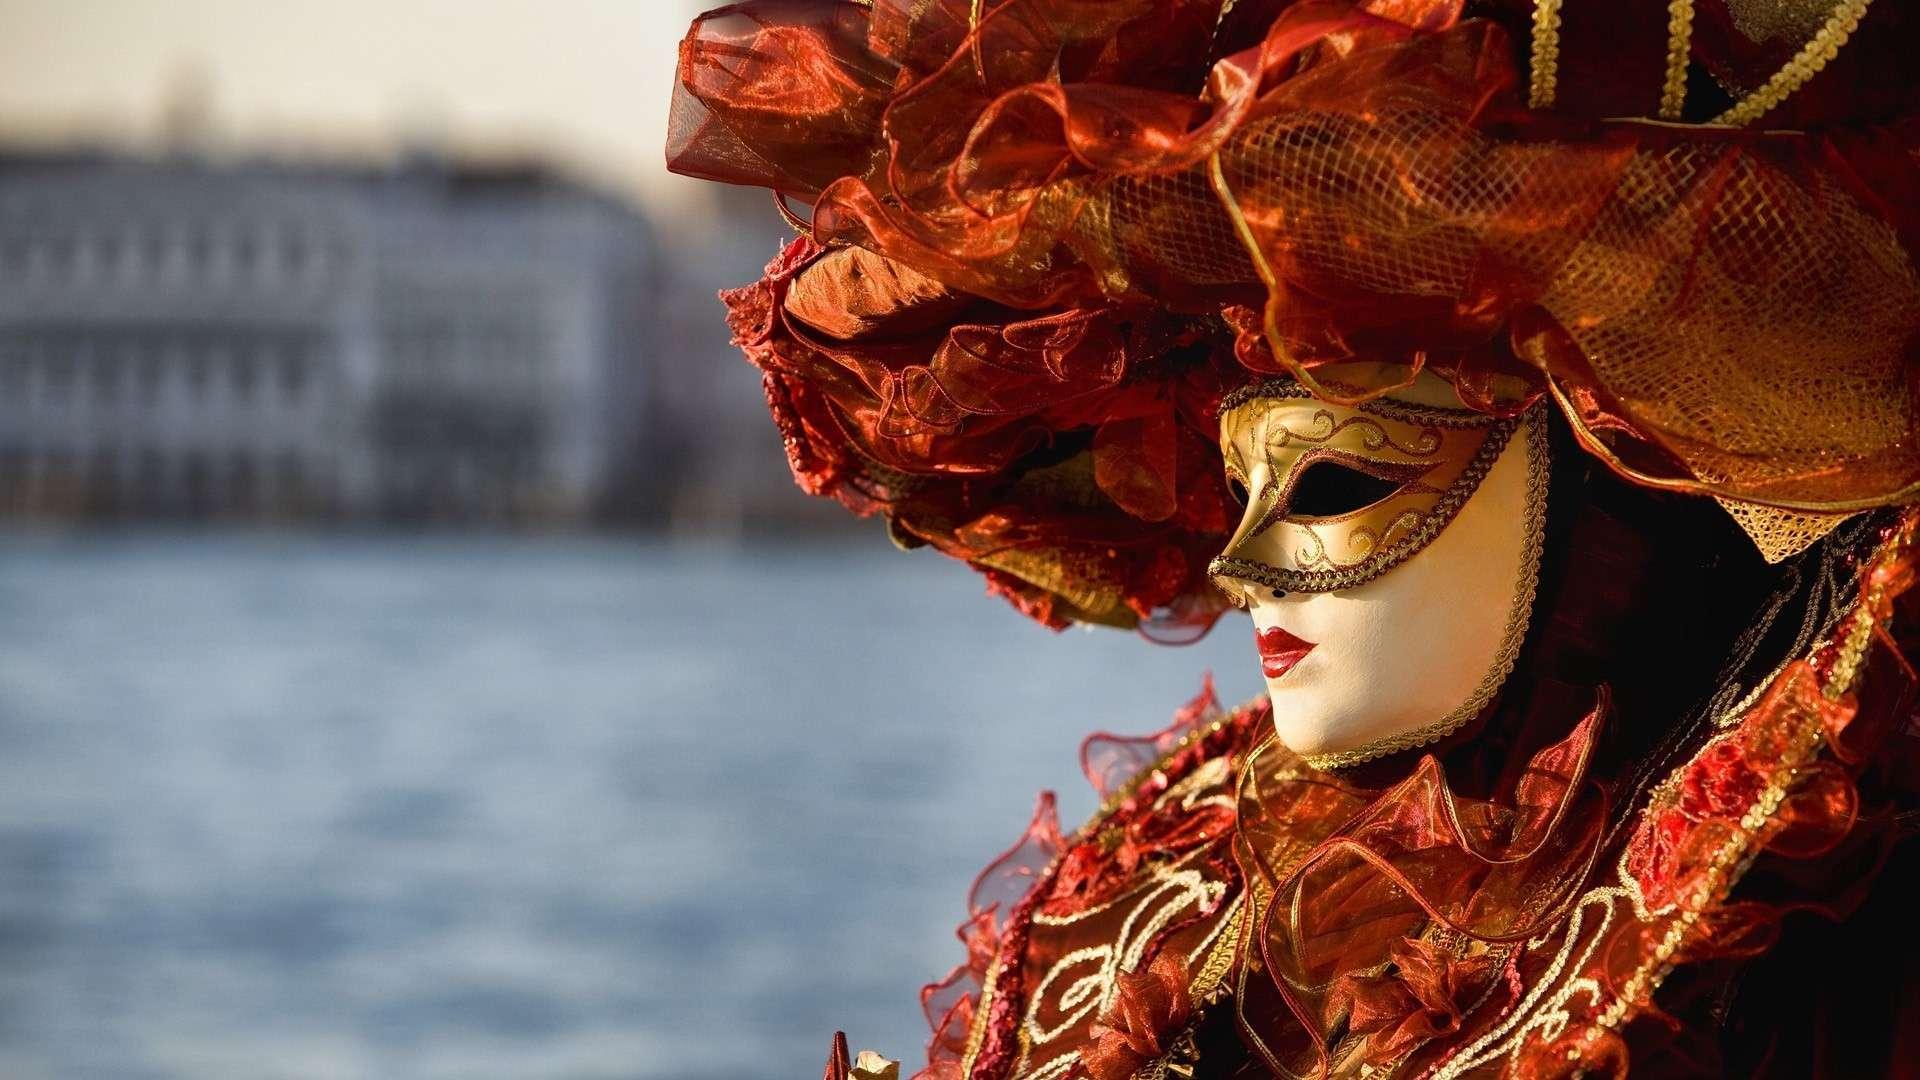 Weekend a Venezia: cosa vedere in due giorni